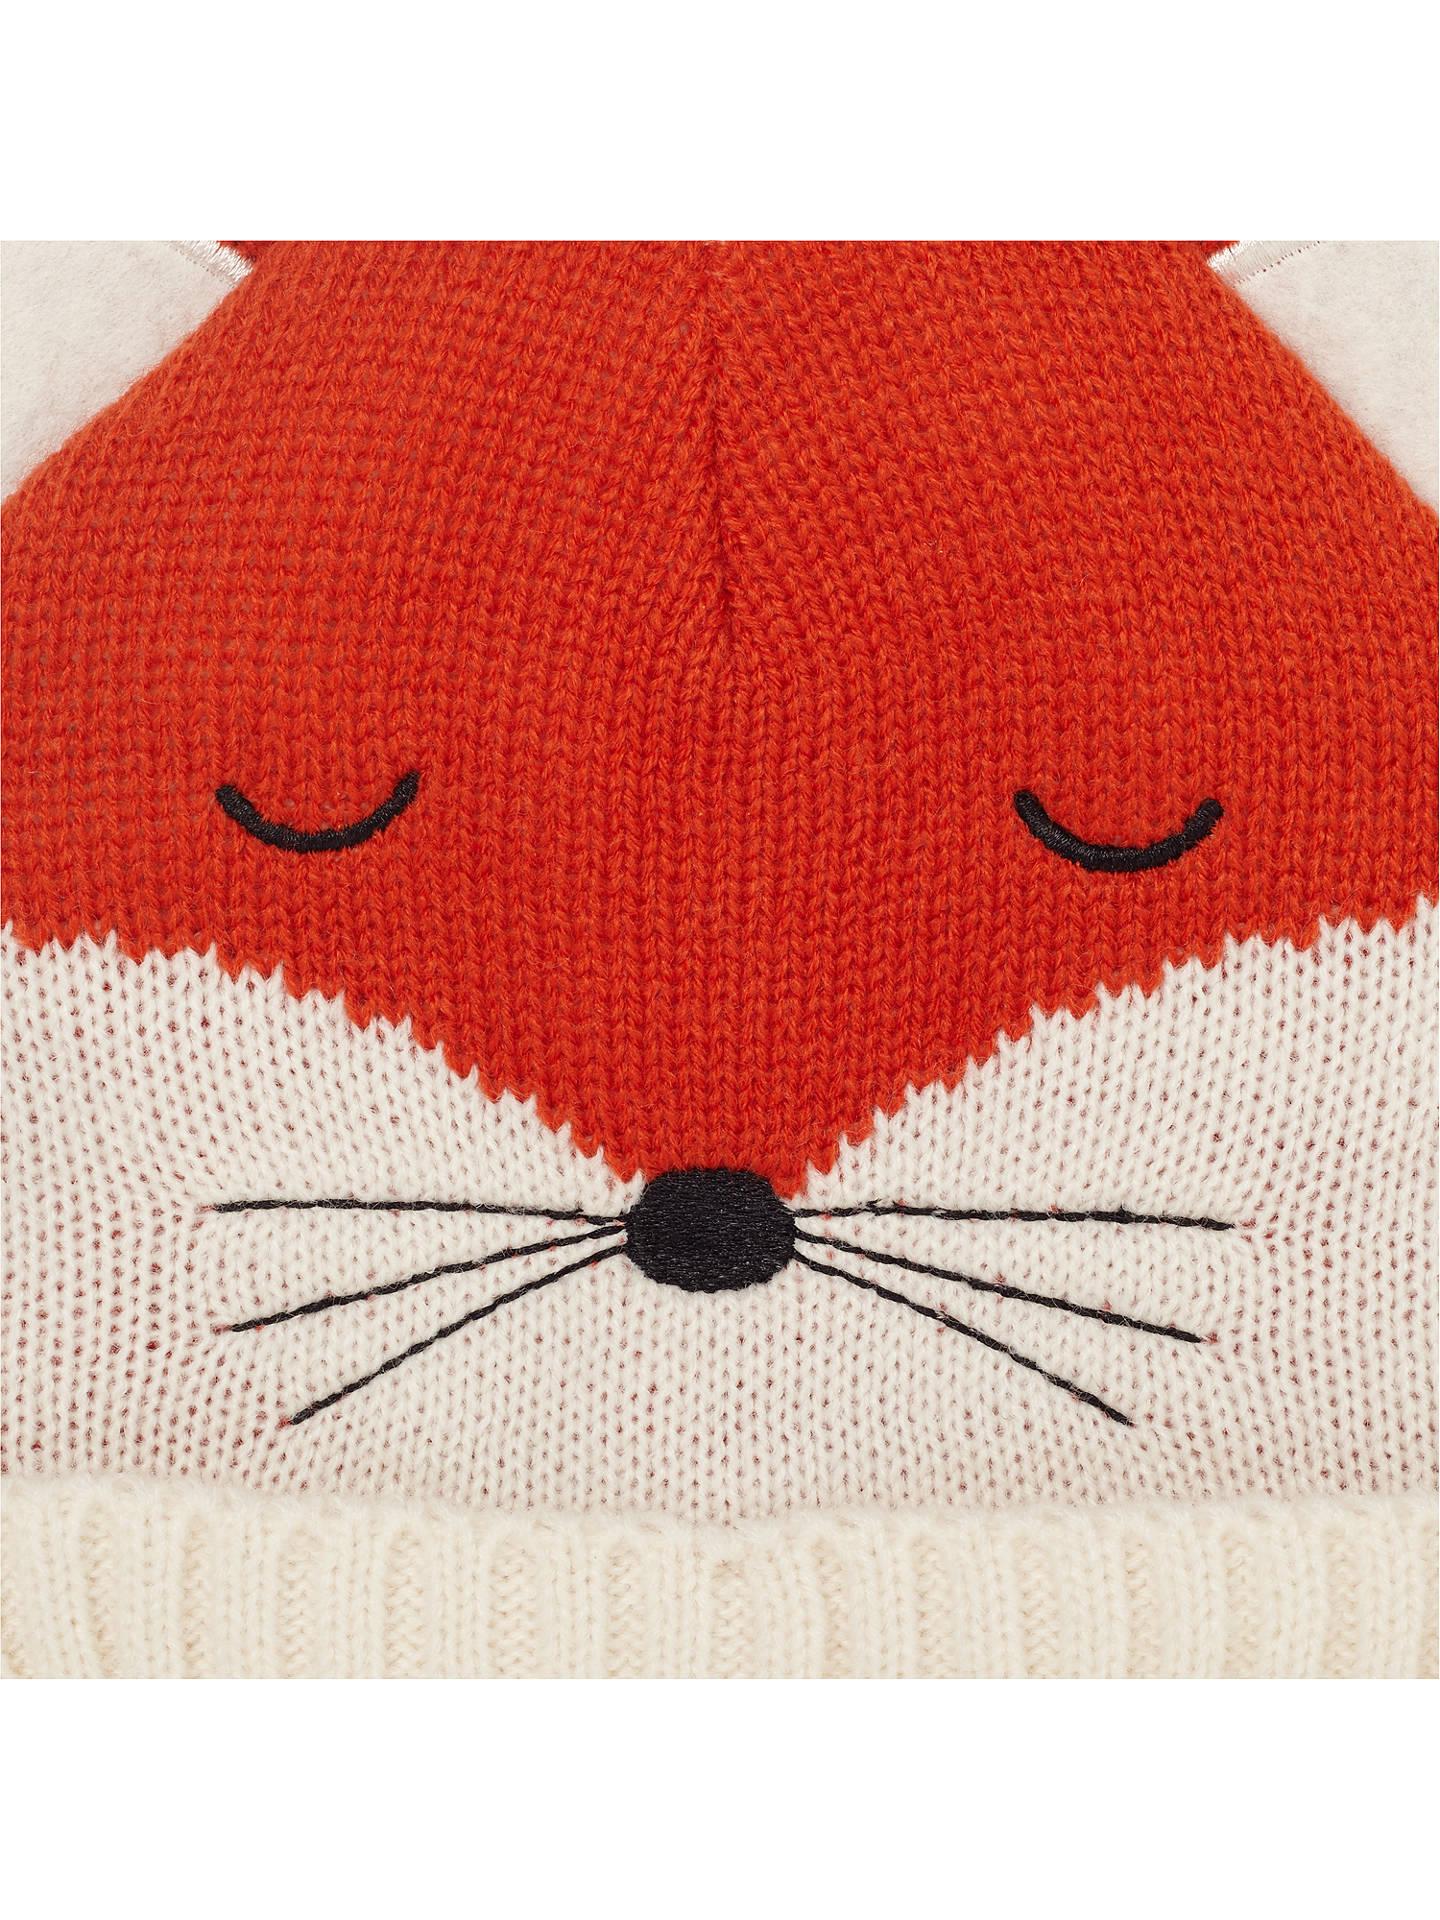 6f379e46d John Lewis & Partners Baby Knitted Fox Character Hat, Orange at John ...